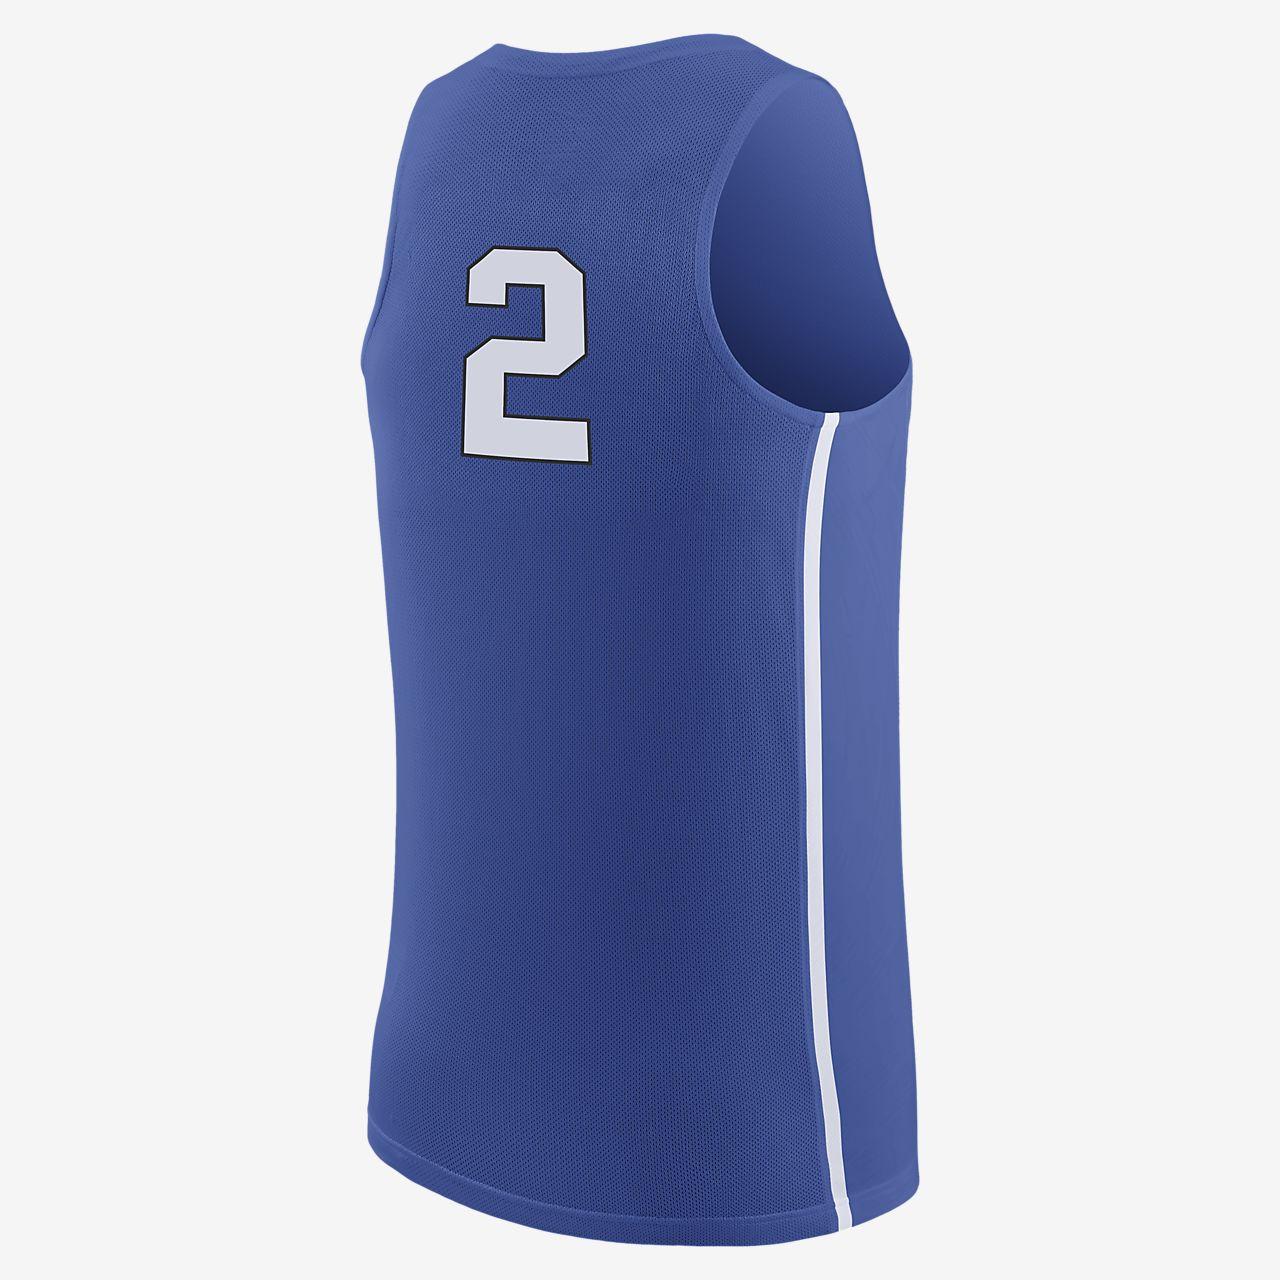 official photos d1648 31784 Nike College Replica (Duke) Men's Basketball Jersey